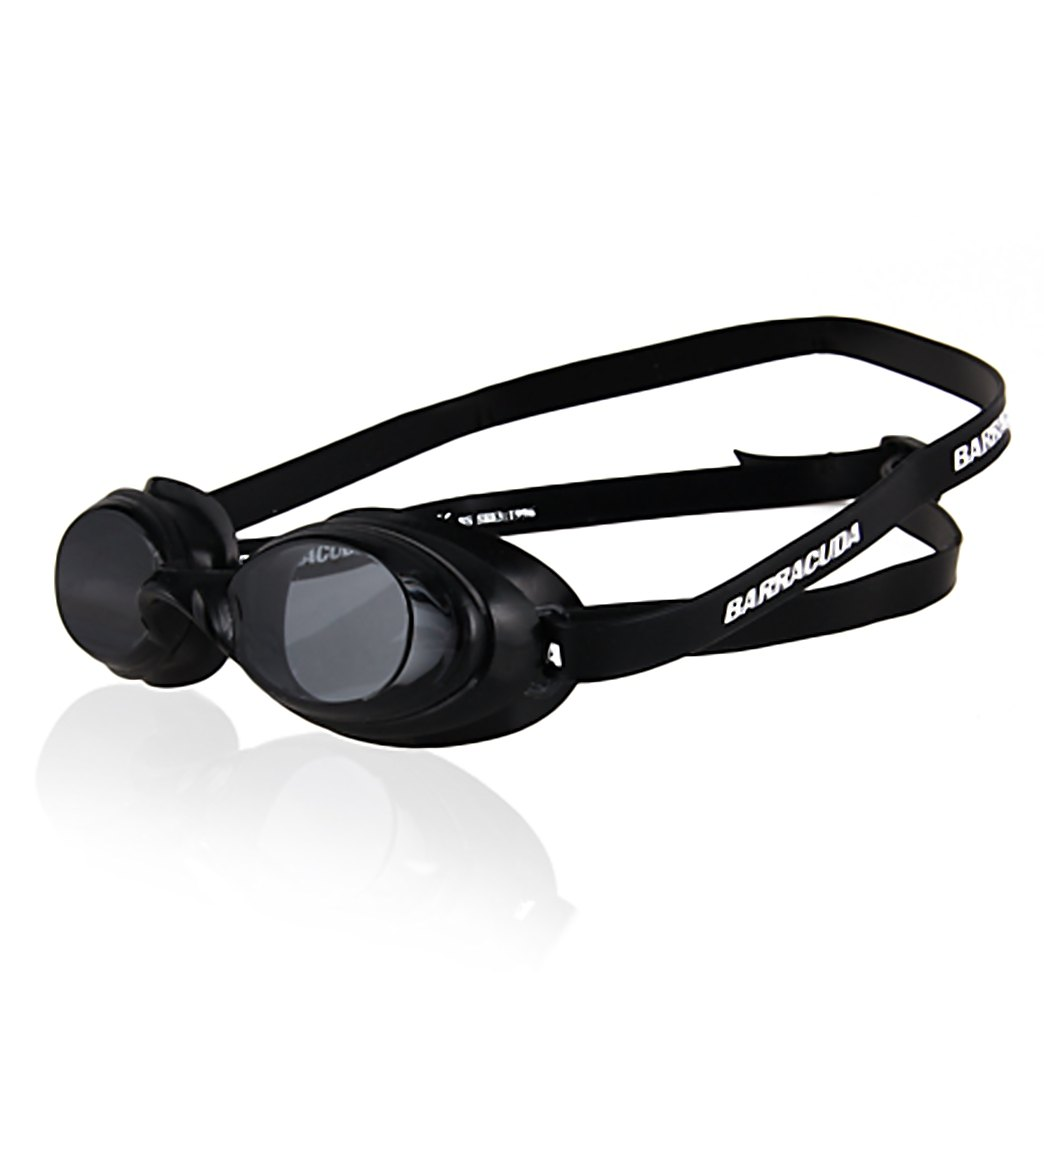 Barracuda Jazz Goggle At Swimoutlet Com